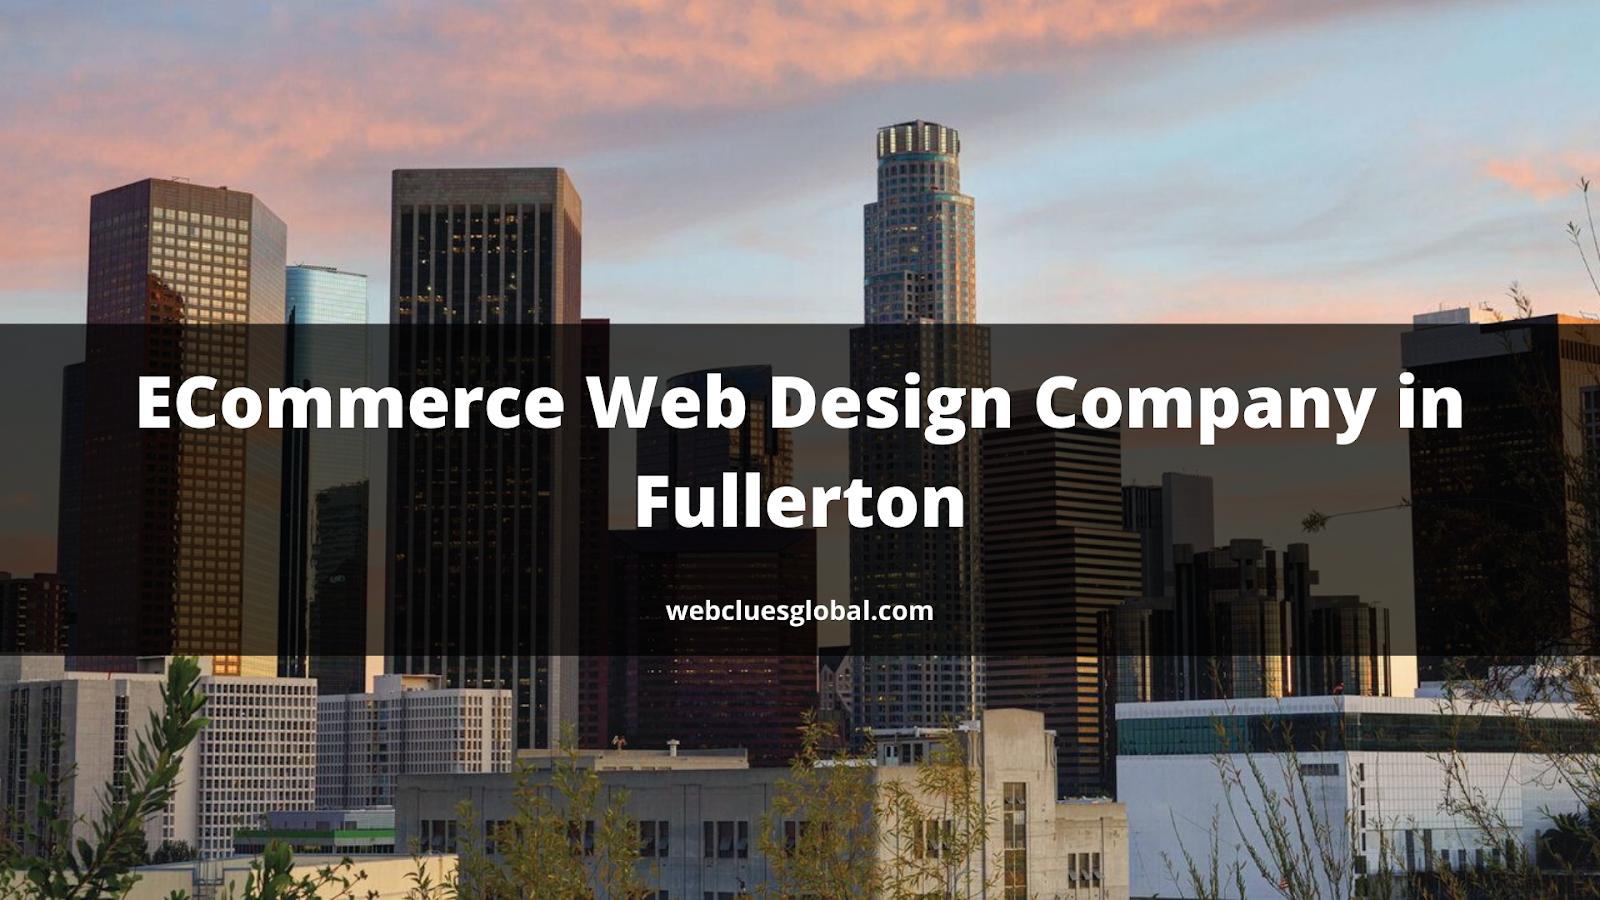 Ecommerce Web Design Company In Fullerton In 2020 Ecommerce Web Design Web Design Company Web Design